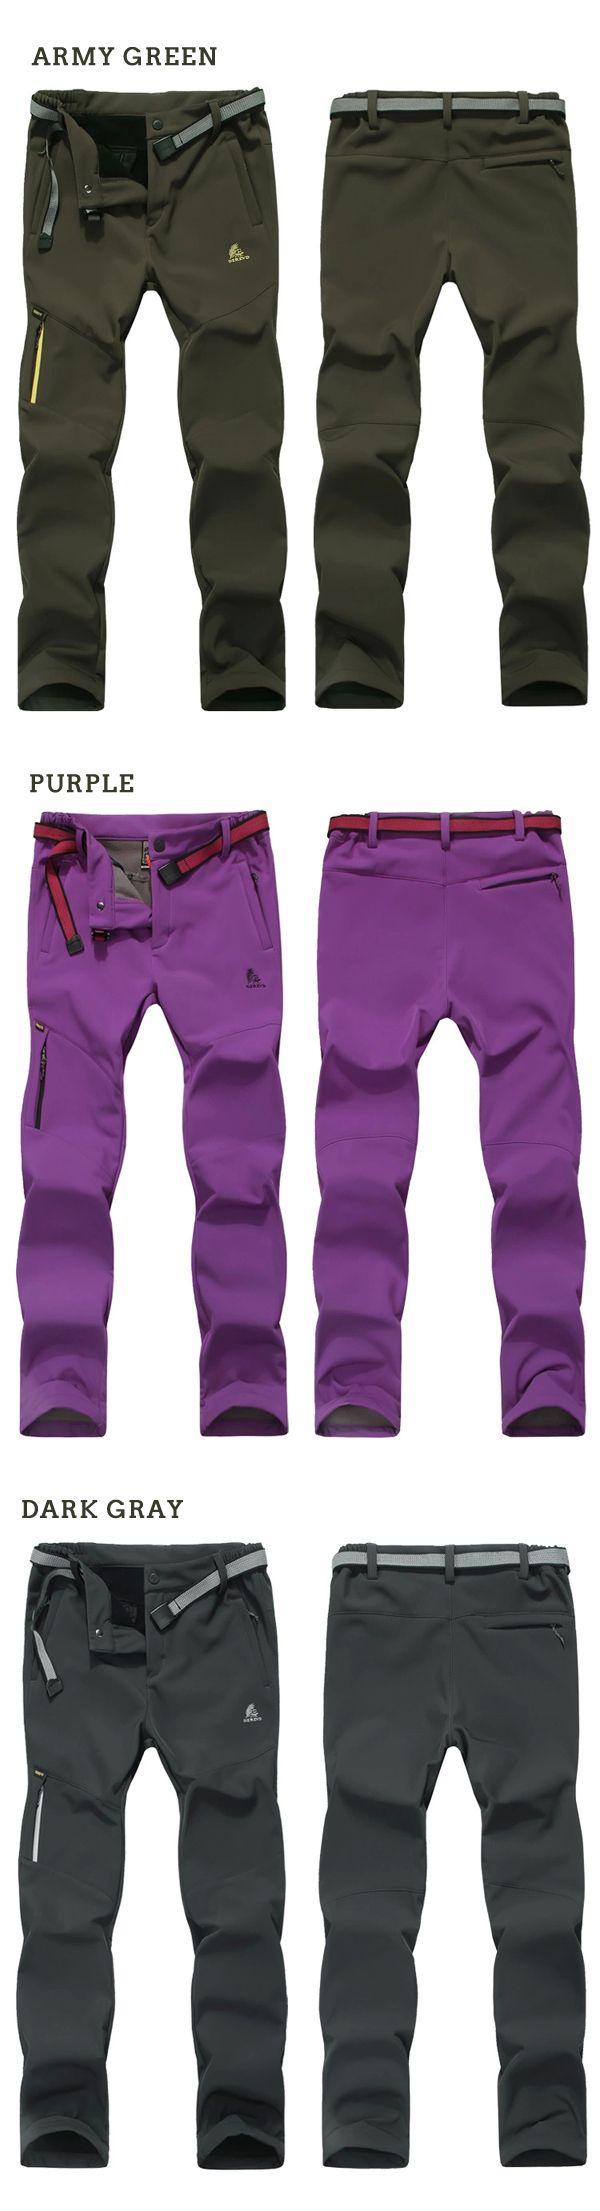 Fleece Waterproof Hiking Skiing Pant Clothing, Shoes & Jewelry - Women - women's hiking clothing - http://amzn.to/2lL1pwW